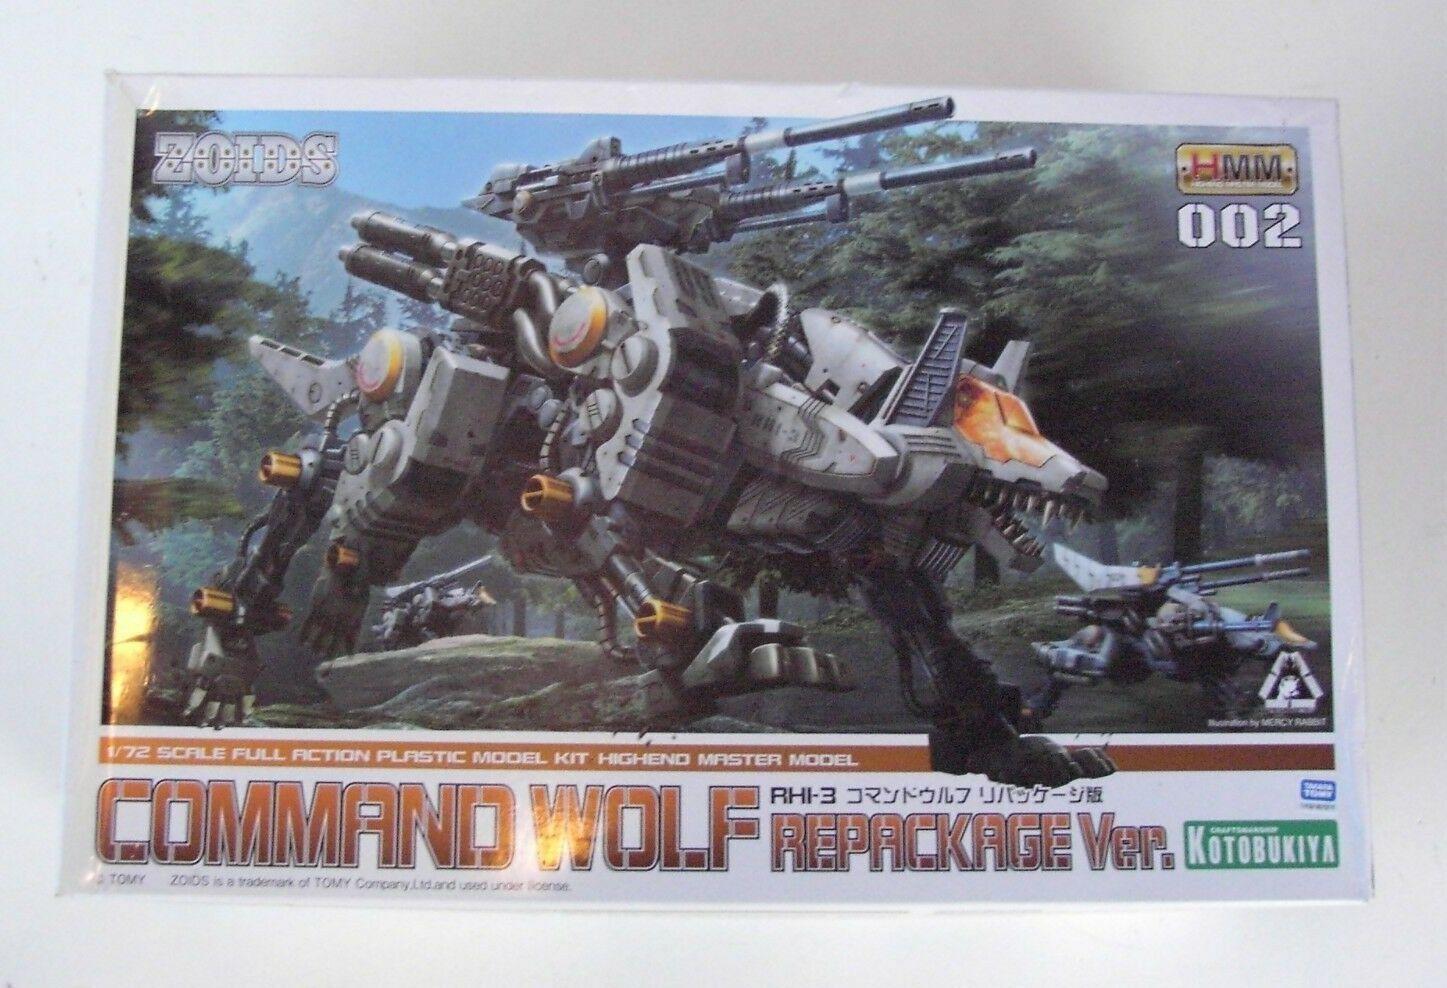 Zoids Kotobukiya hmm 002 RHI-3 Comando Wolf Menta en caja